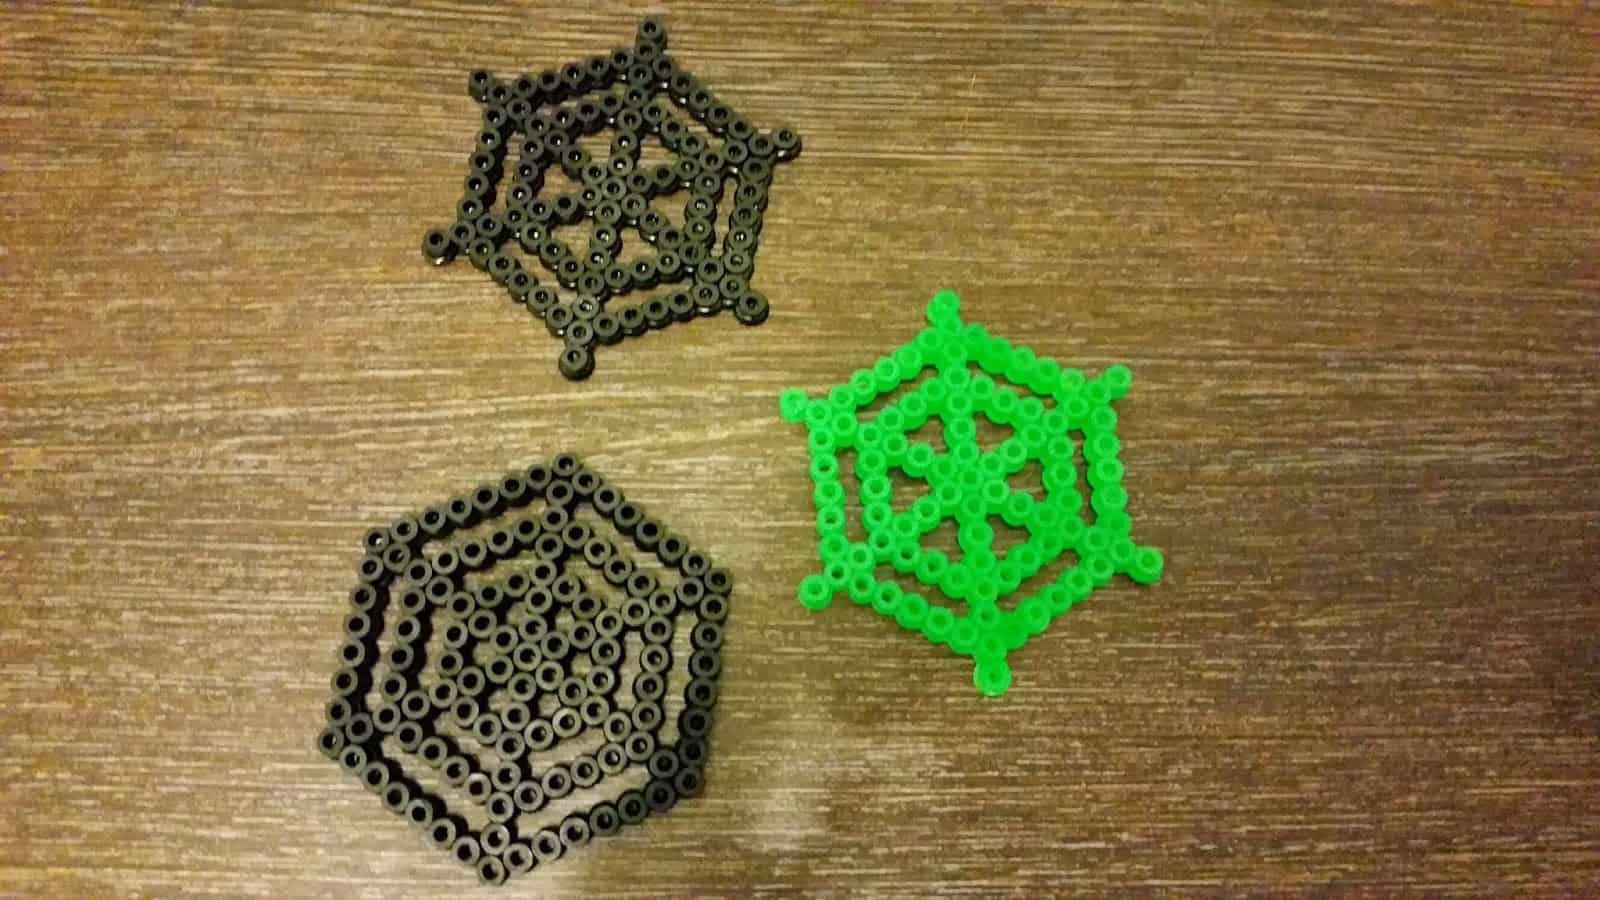 Hama bead spider webs